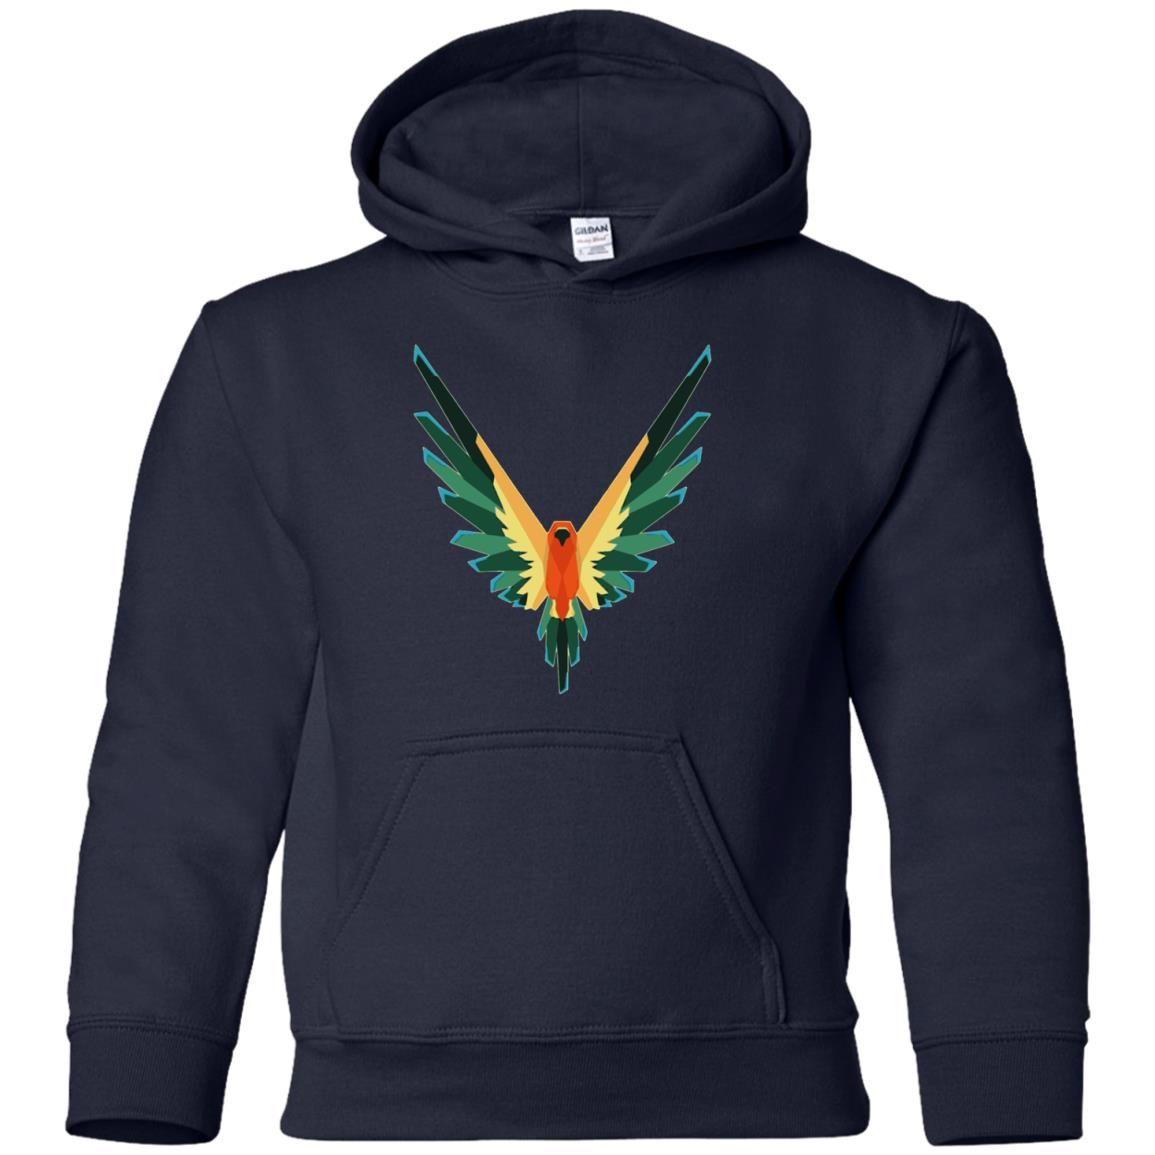 image 1235 - Logan Paul Maverick kid shirt & sweatshirt